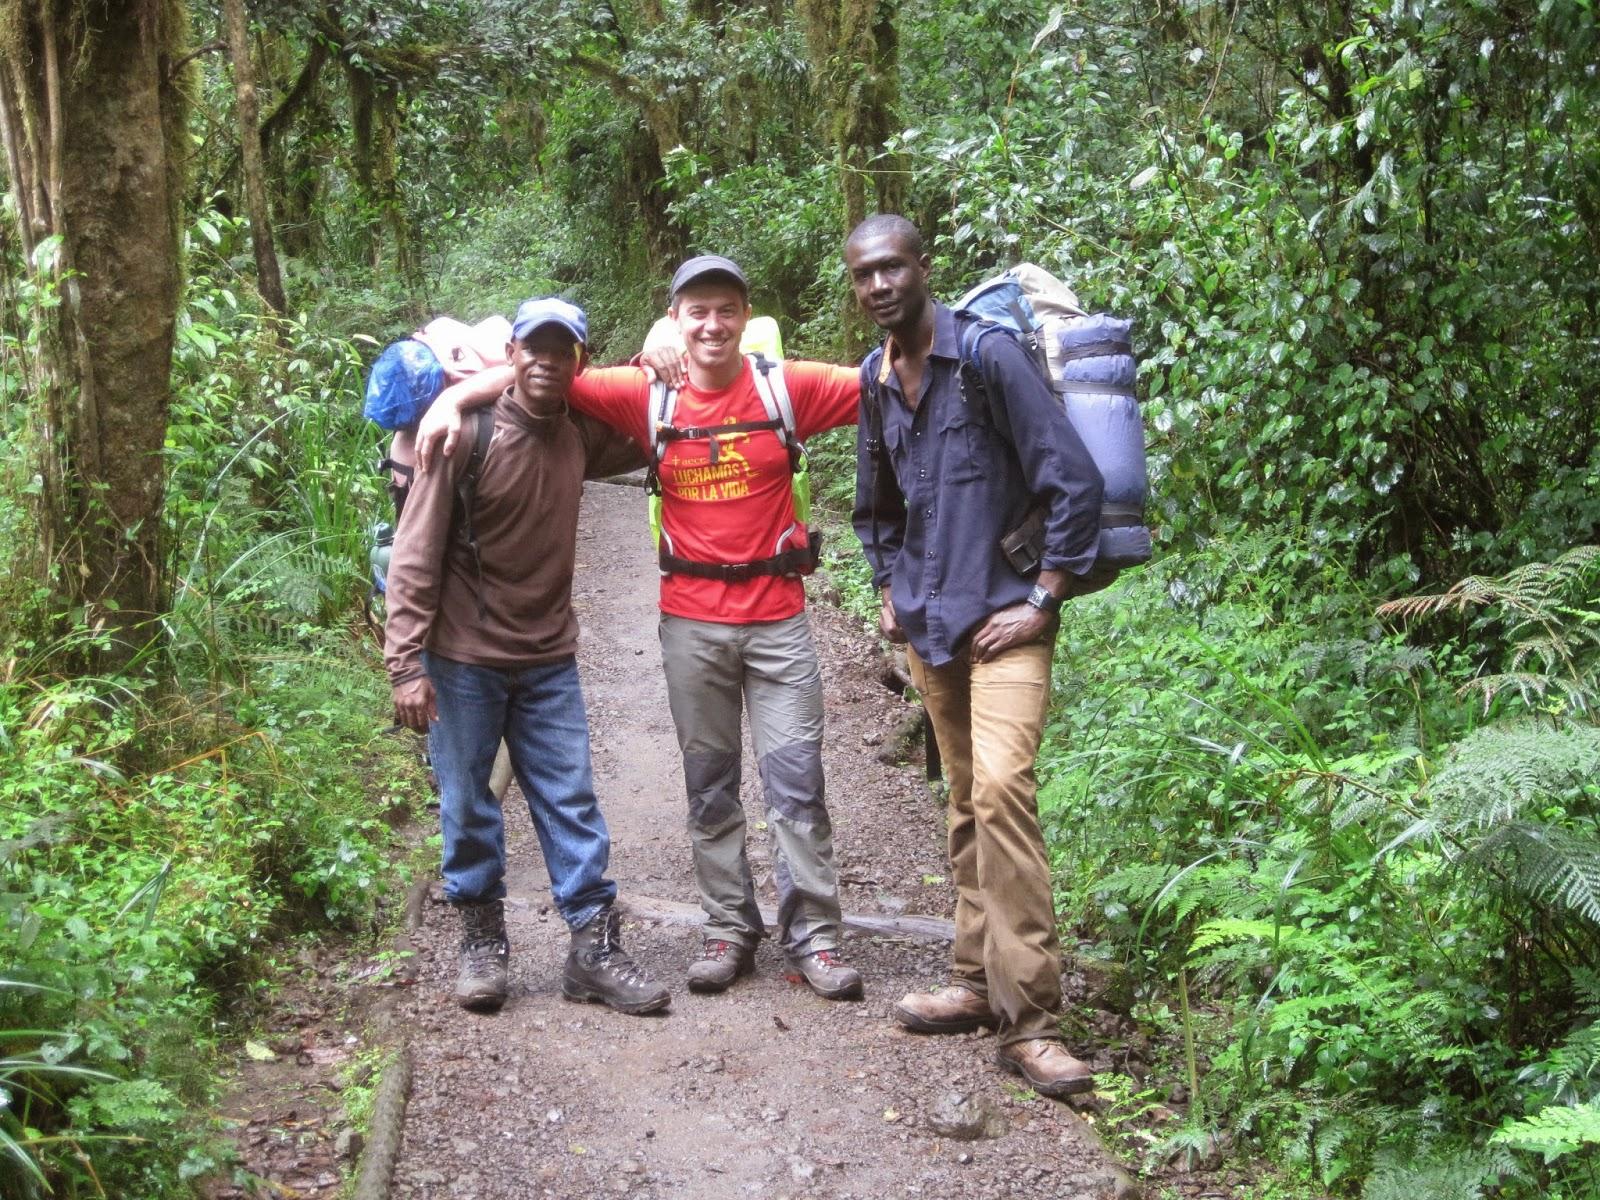 ENLACIMA-Lipe-con-dos-guías-tanzanos-Kilimanjaro-Ruta-Machame